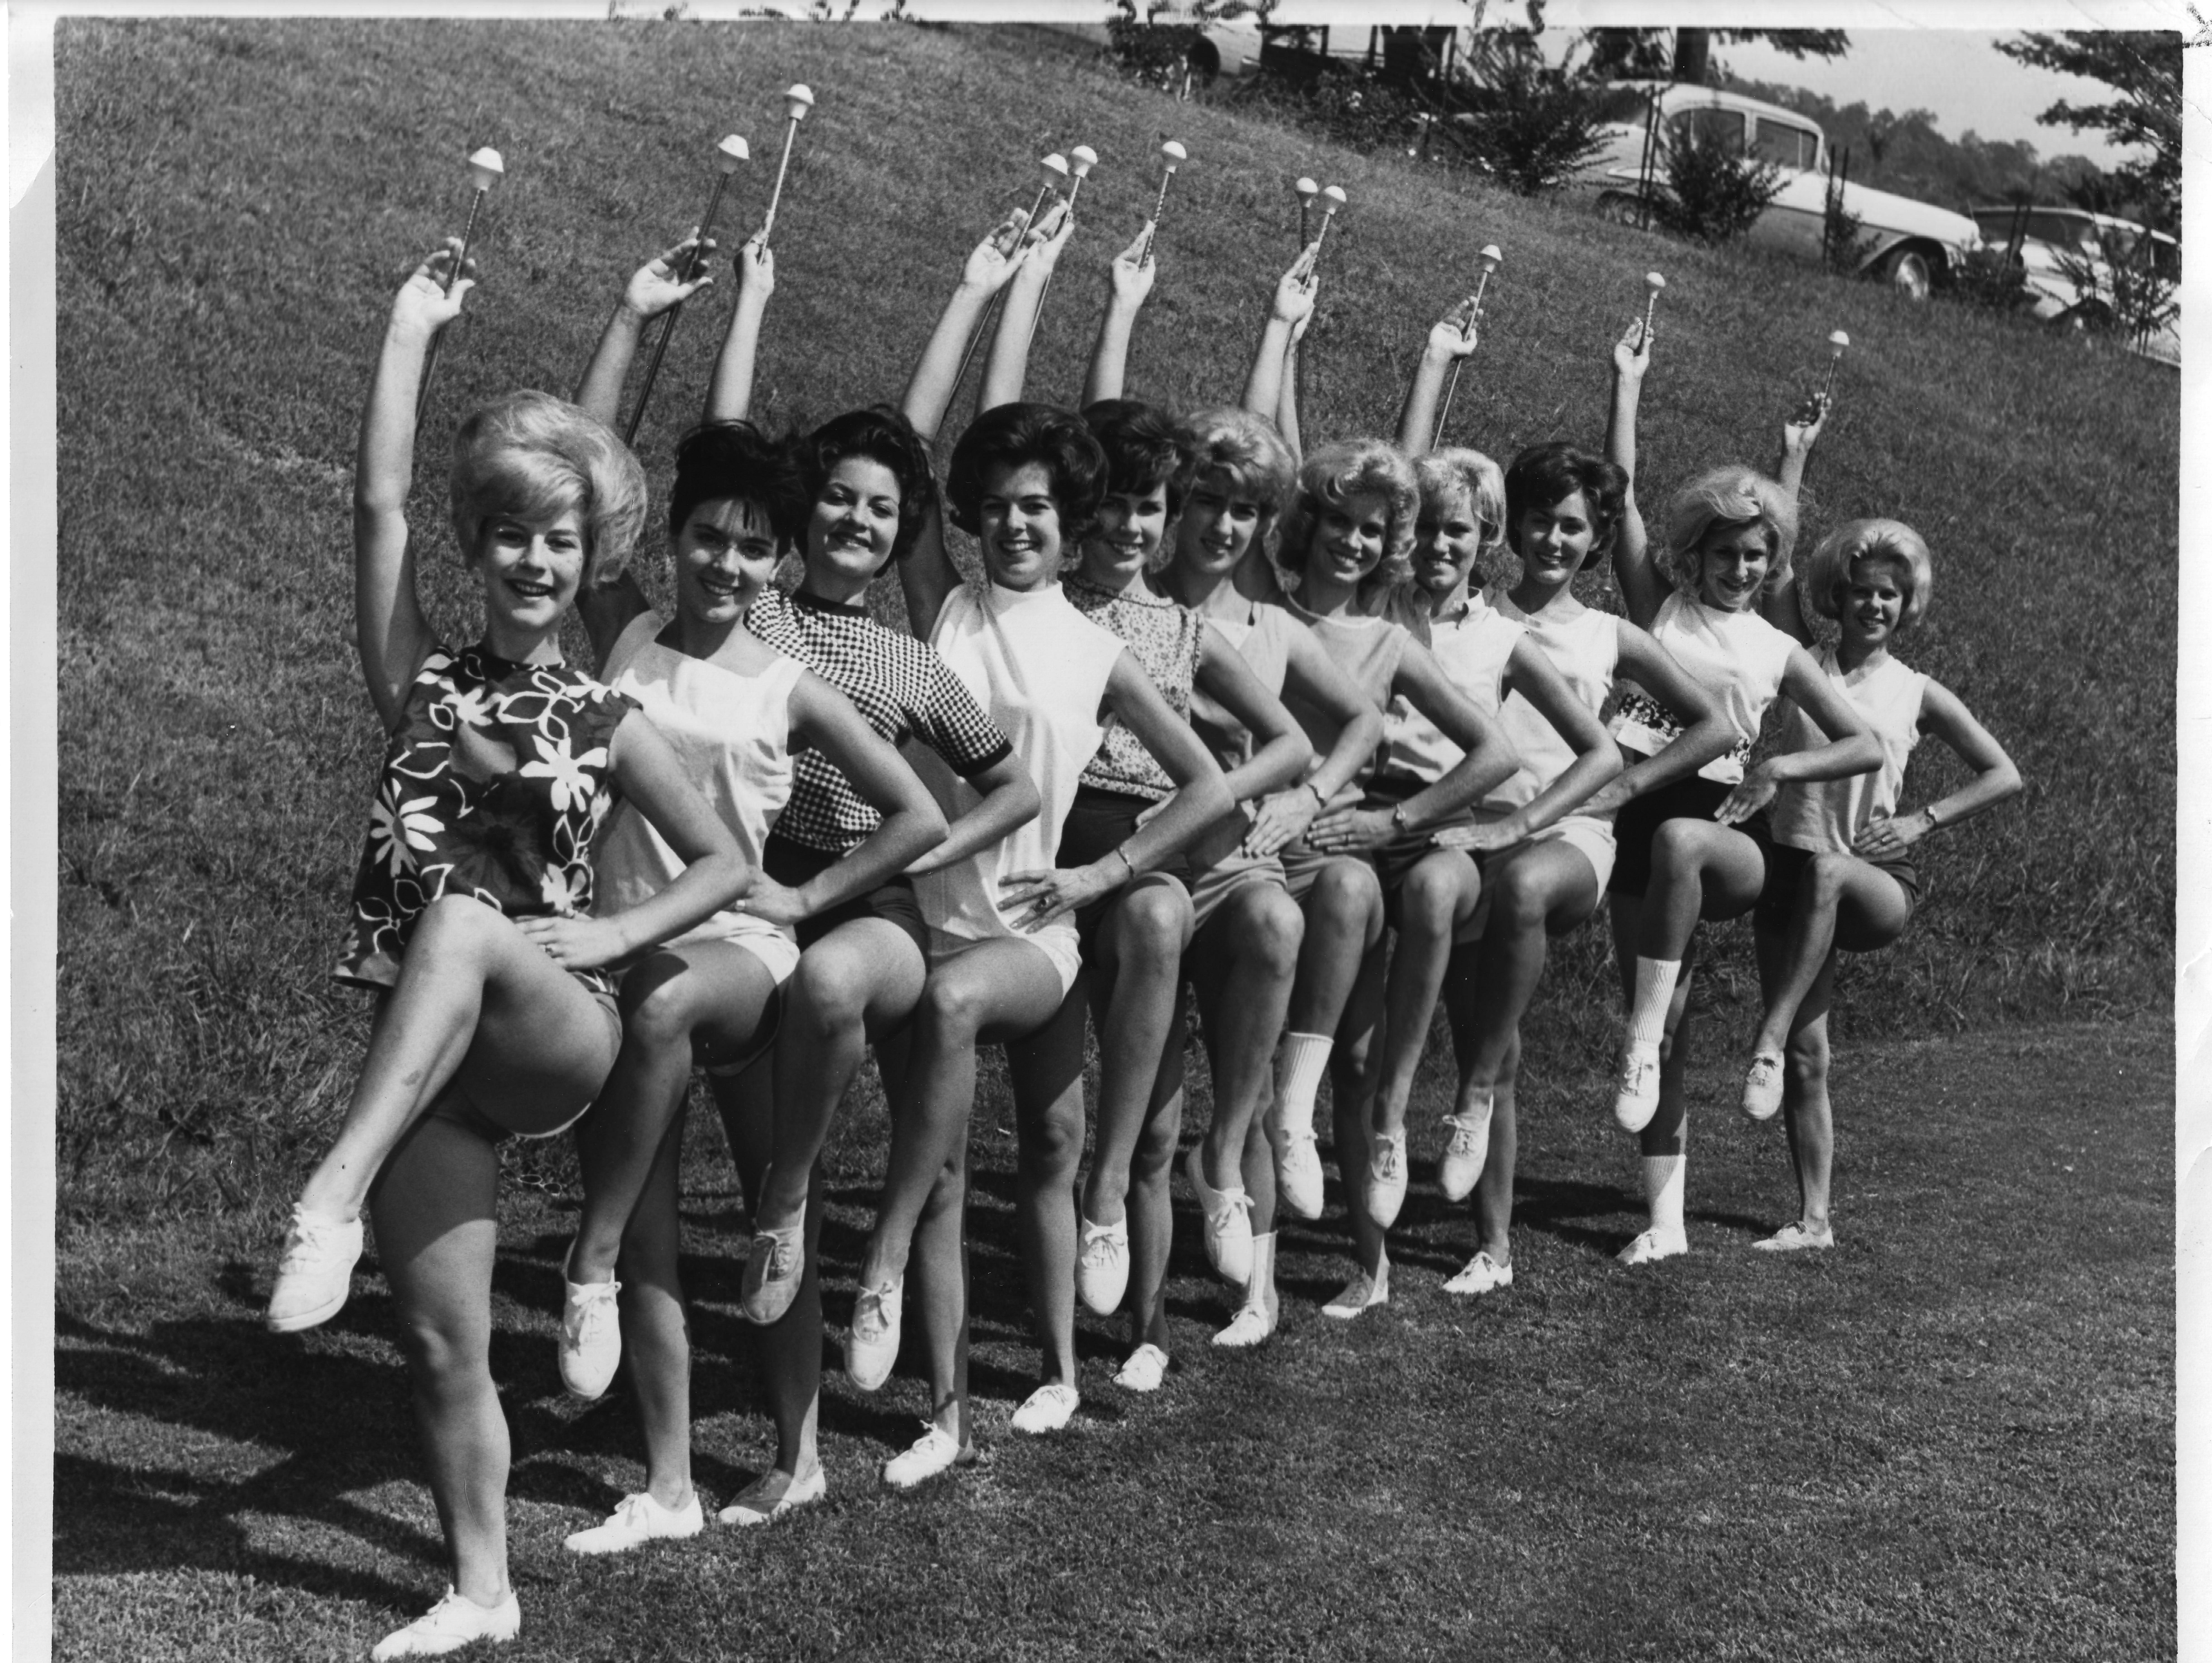 University of Tennessee majorettes, from left, DeAnna Smith, Marcia Austin, Betty Sue Little, Bette Carlson, Patti Stuart, Brenda Flowers, Judy Barton, Melinda Hewgley, Valerie Foster, Brenda Murrell, Mary Nicholon.